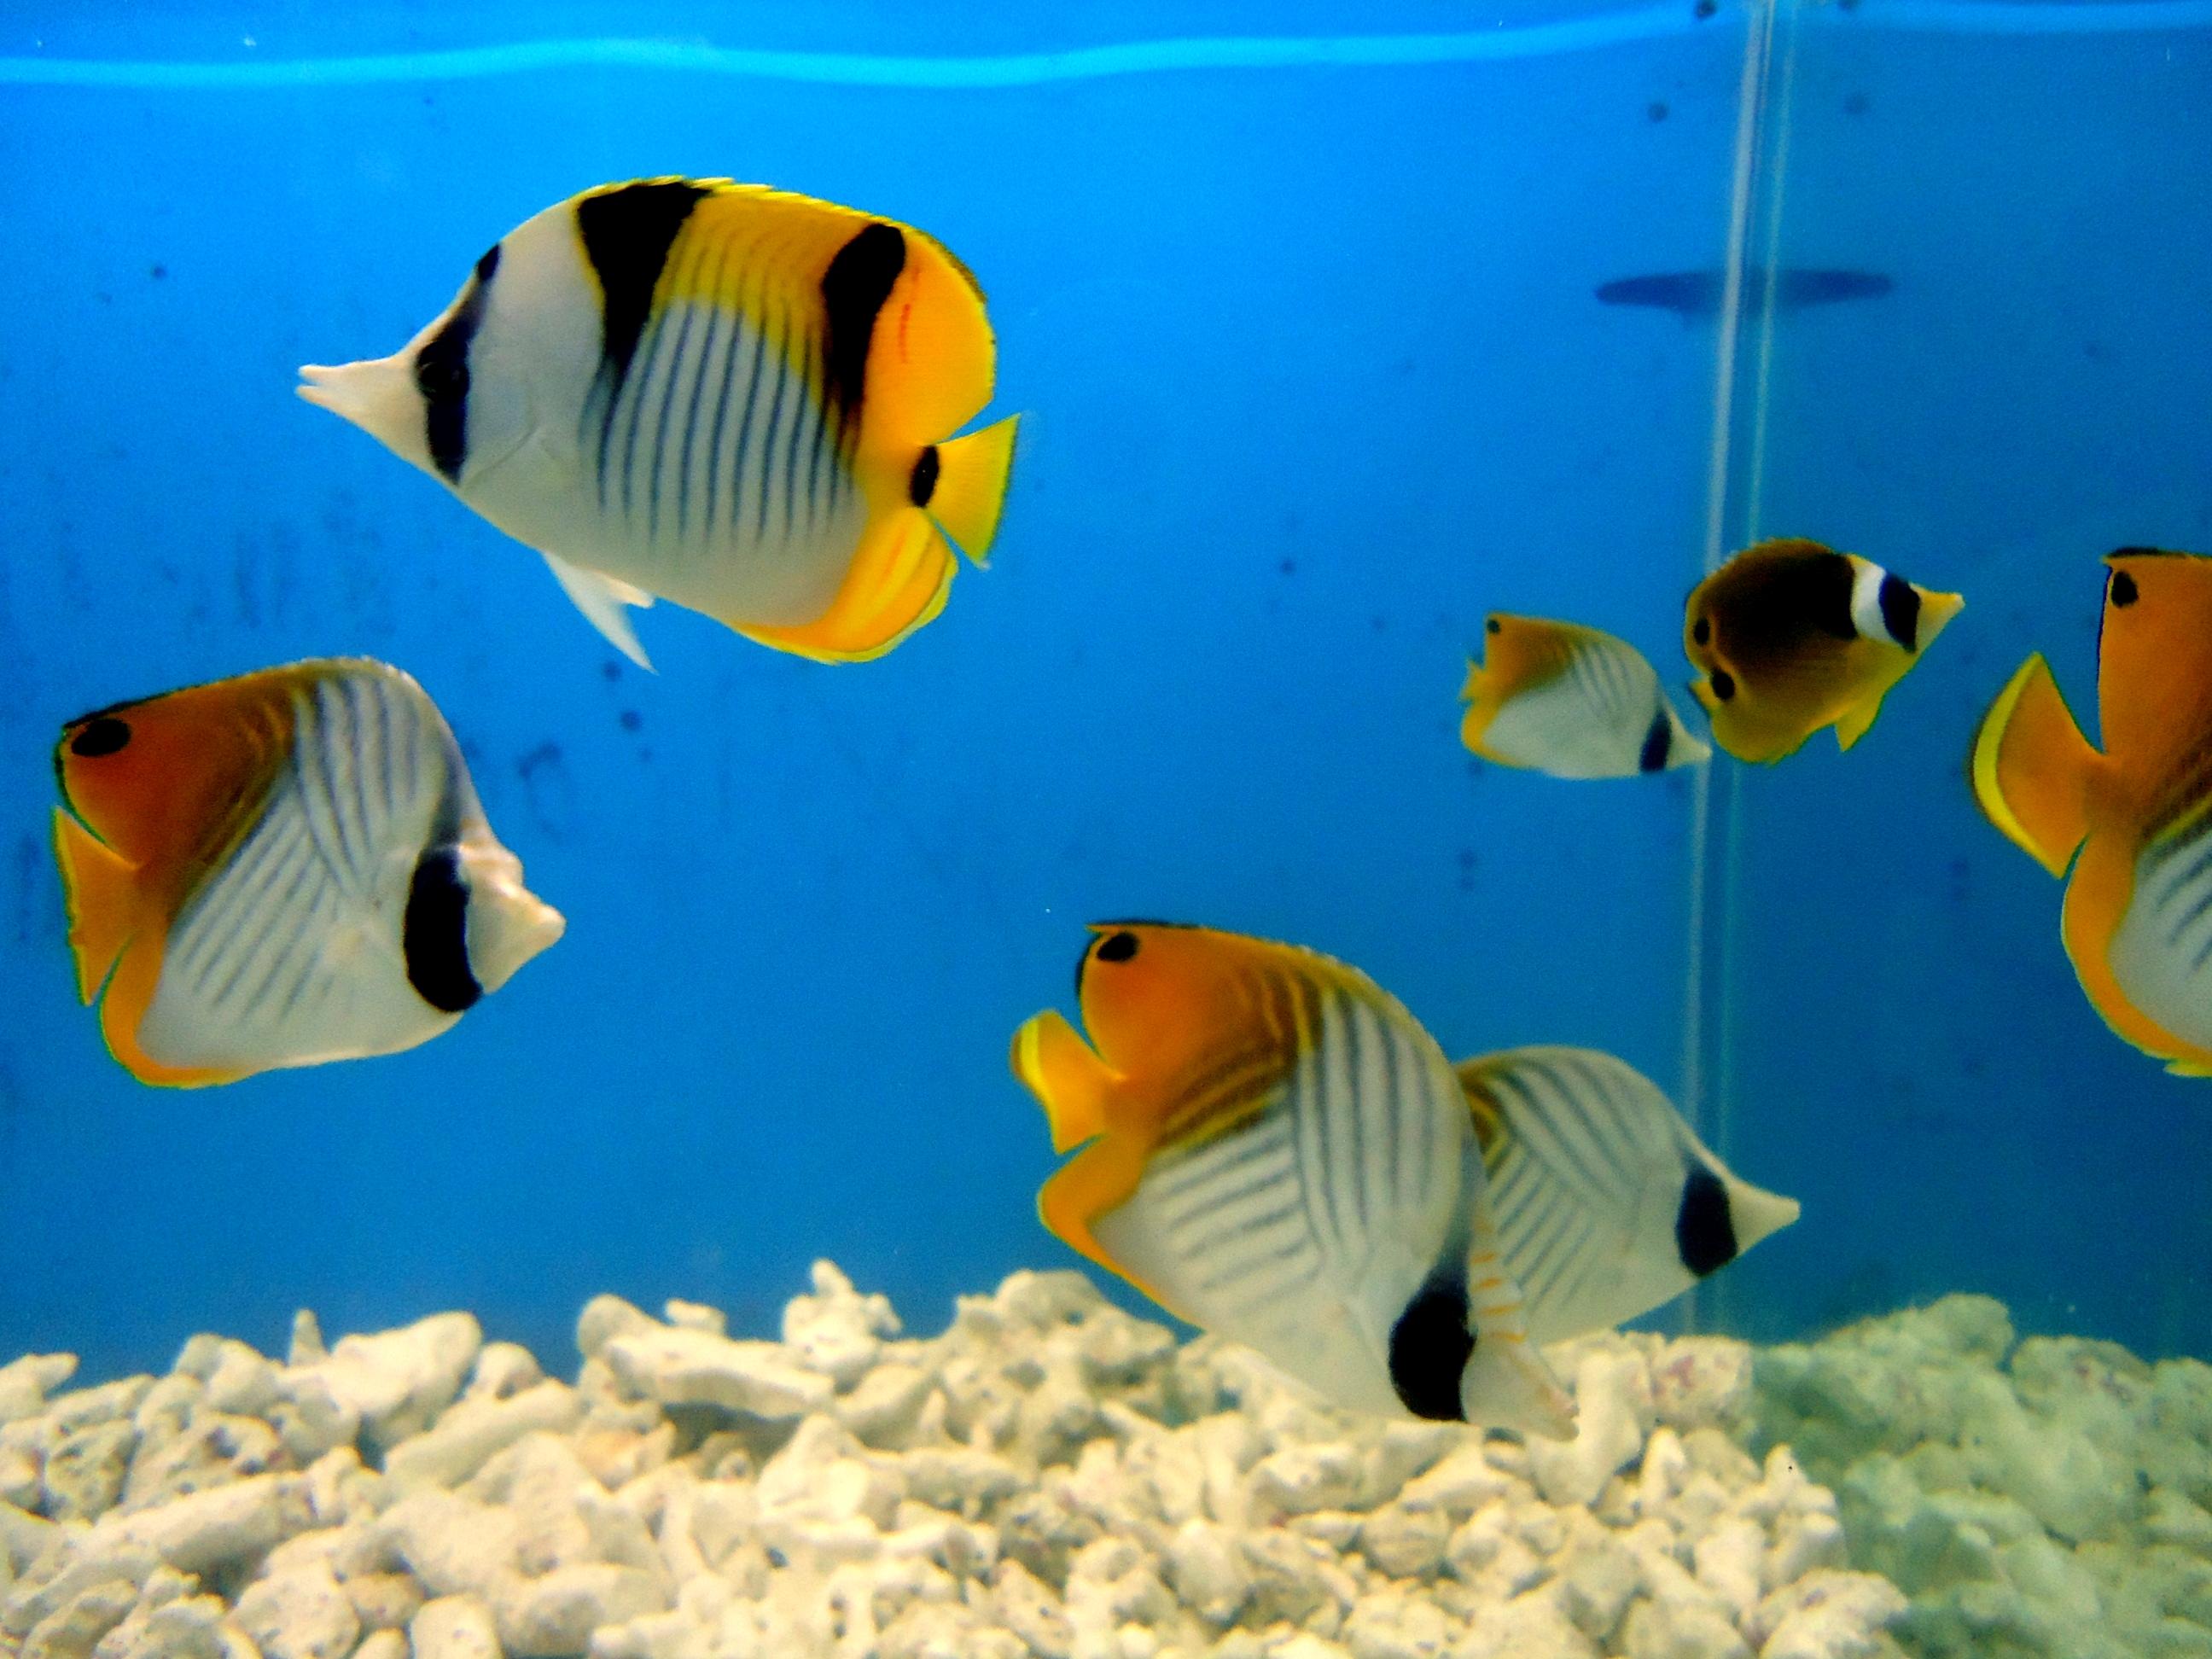 File:Yellow Aquarium Fish.JPG - Wikimedia Commons